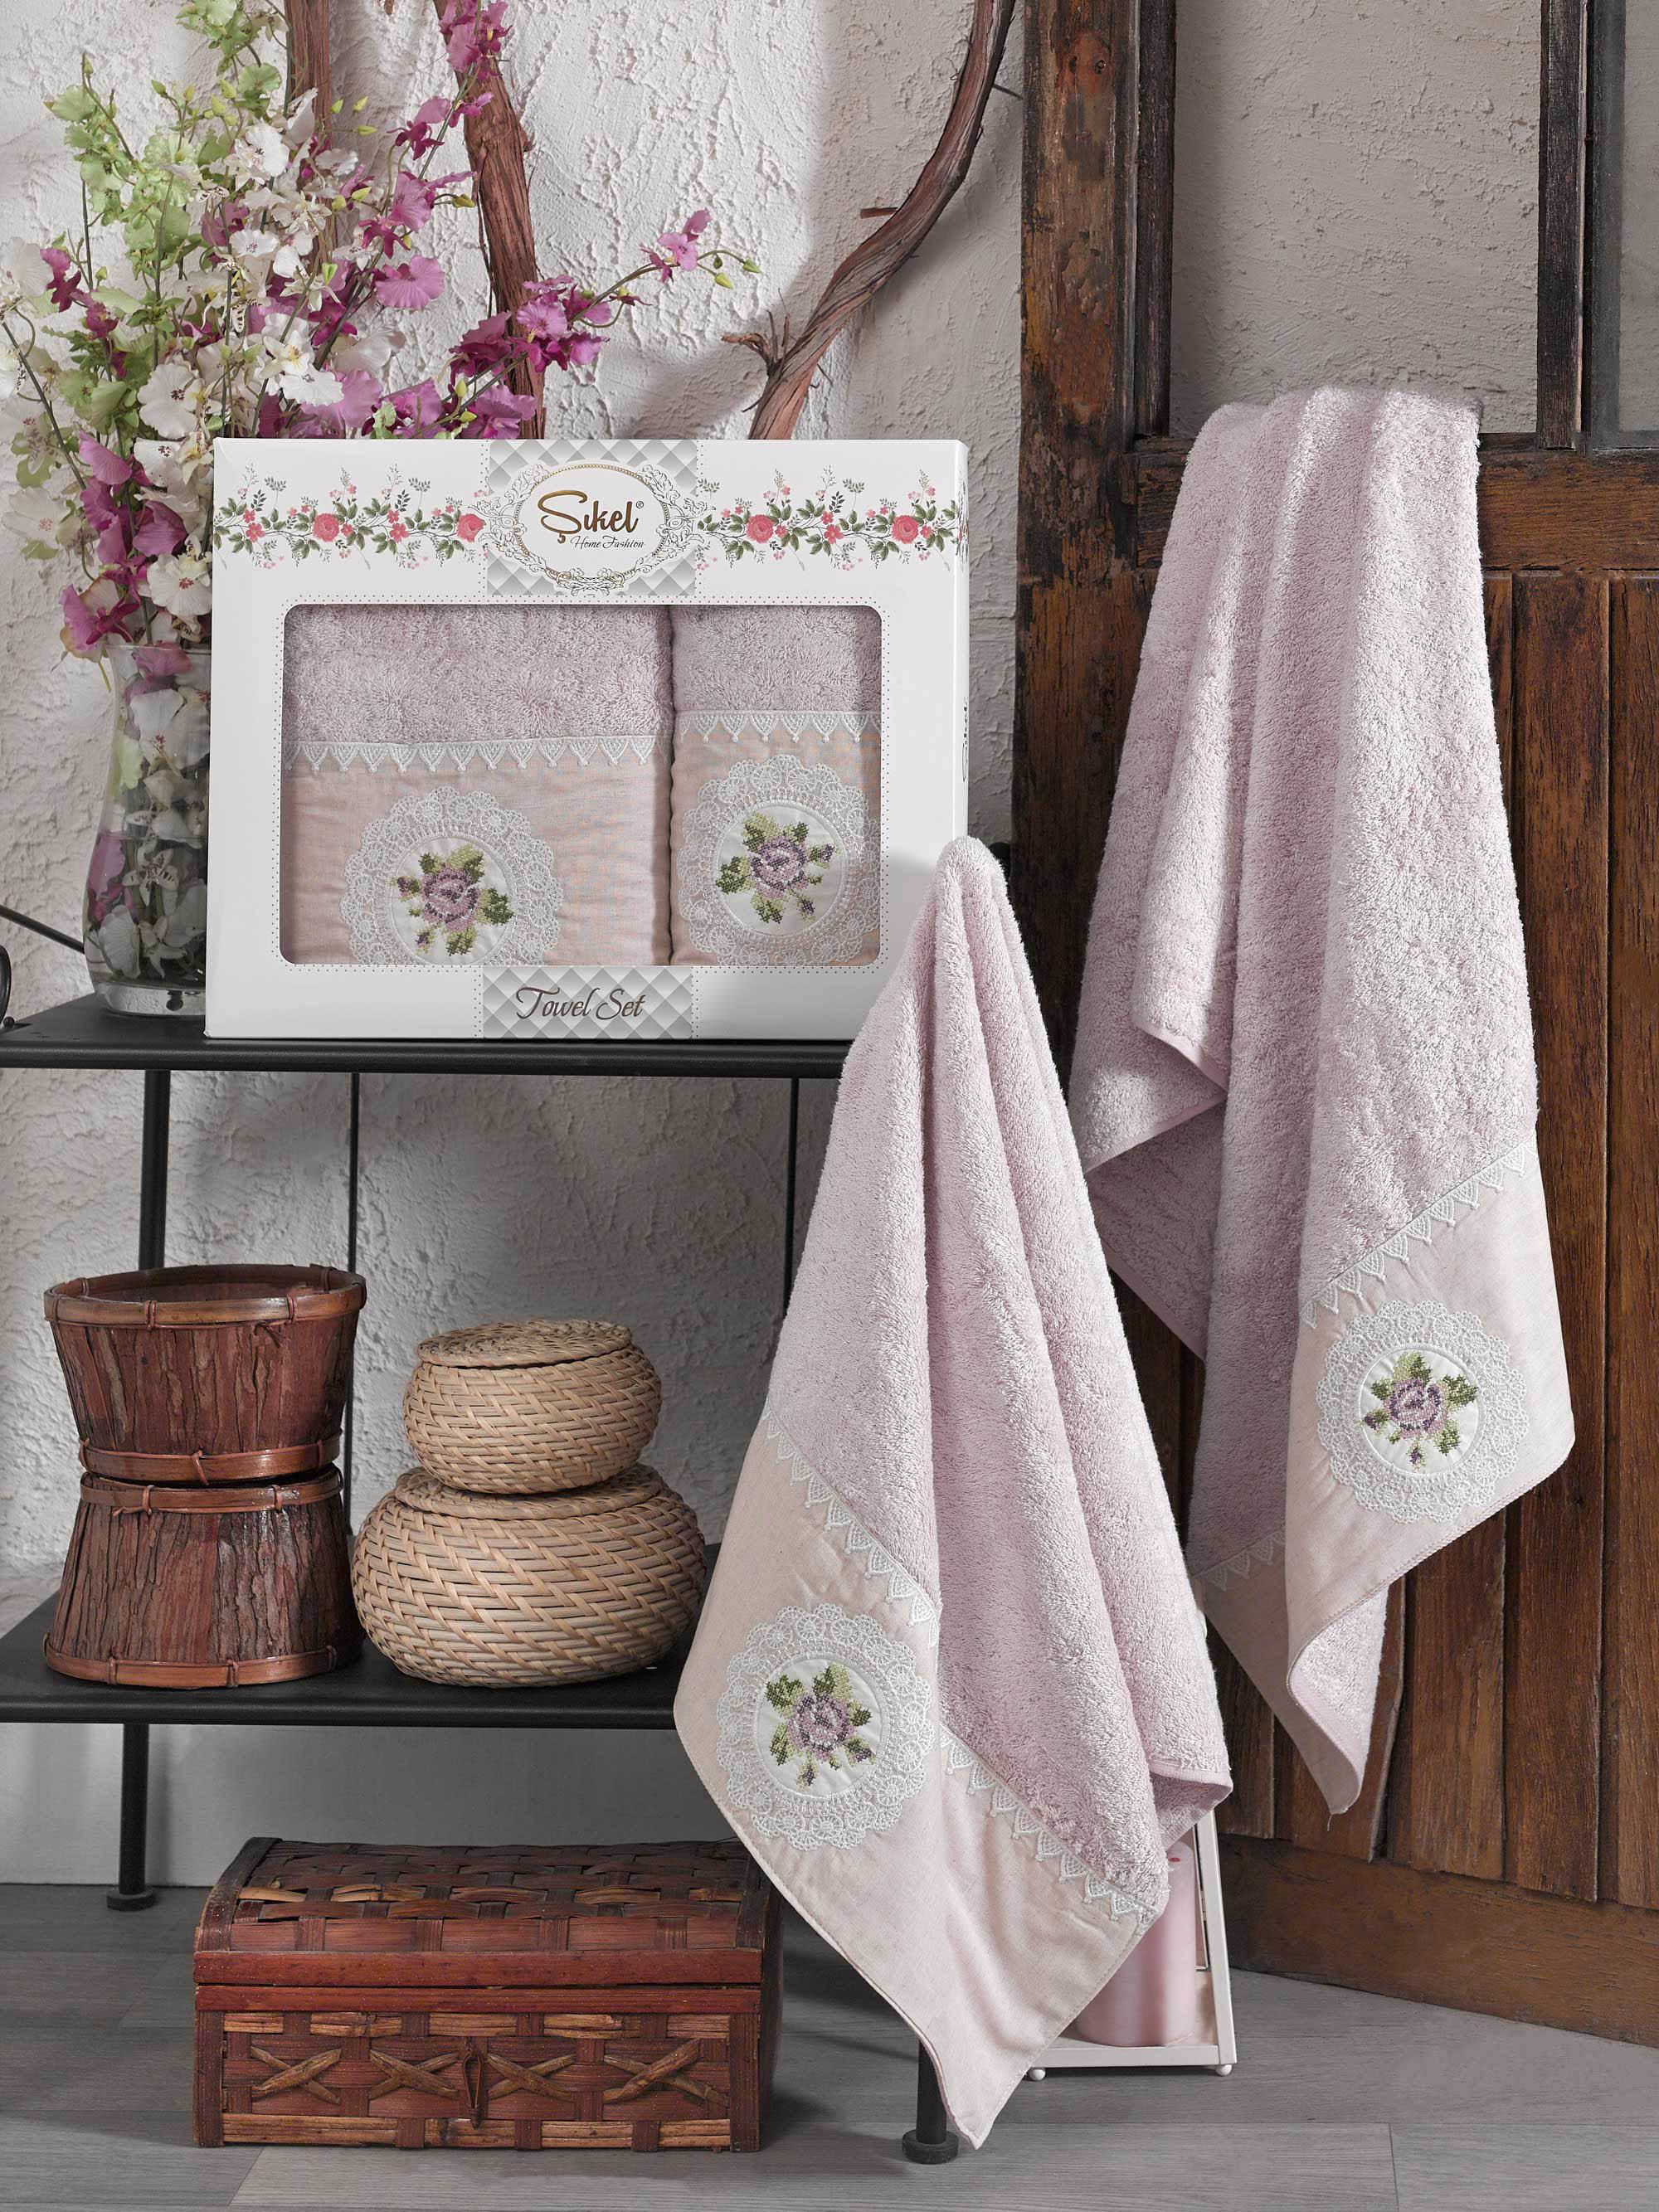 Полотенца Sikel Полотенце Kanevice Цвет: Лиловый (50х90 см,70х140 см) полотенца sikel полотенце kanevice цвет пудра 50х90 см 70х140 см